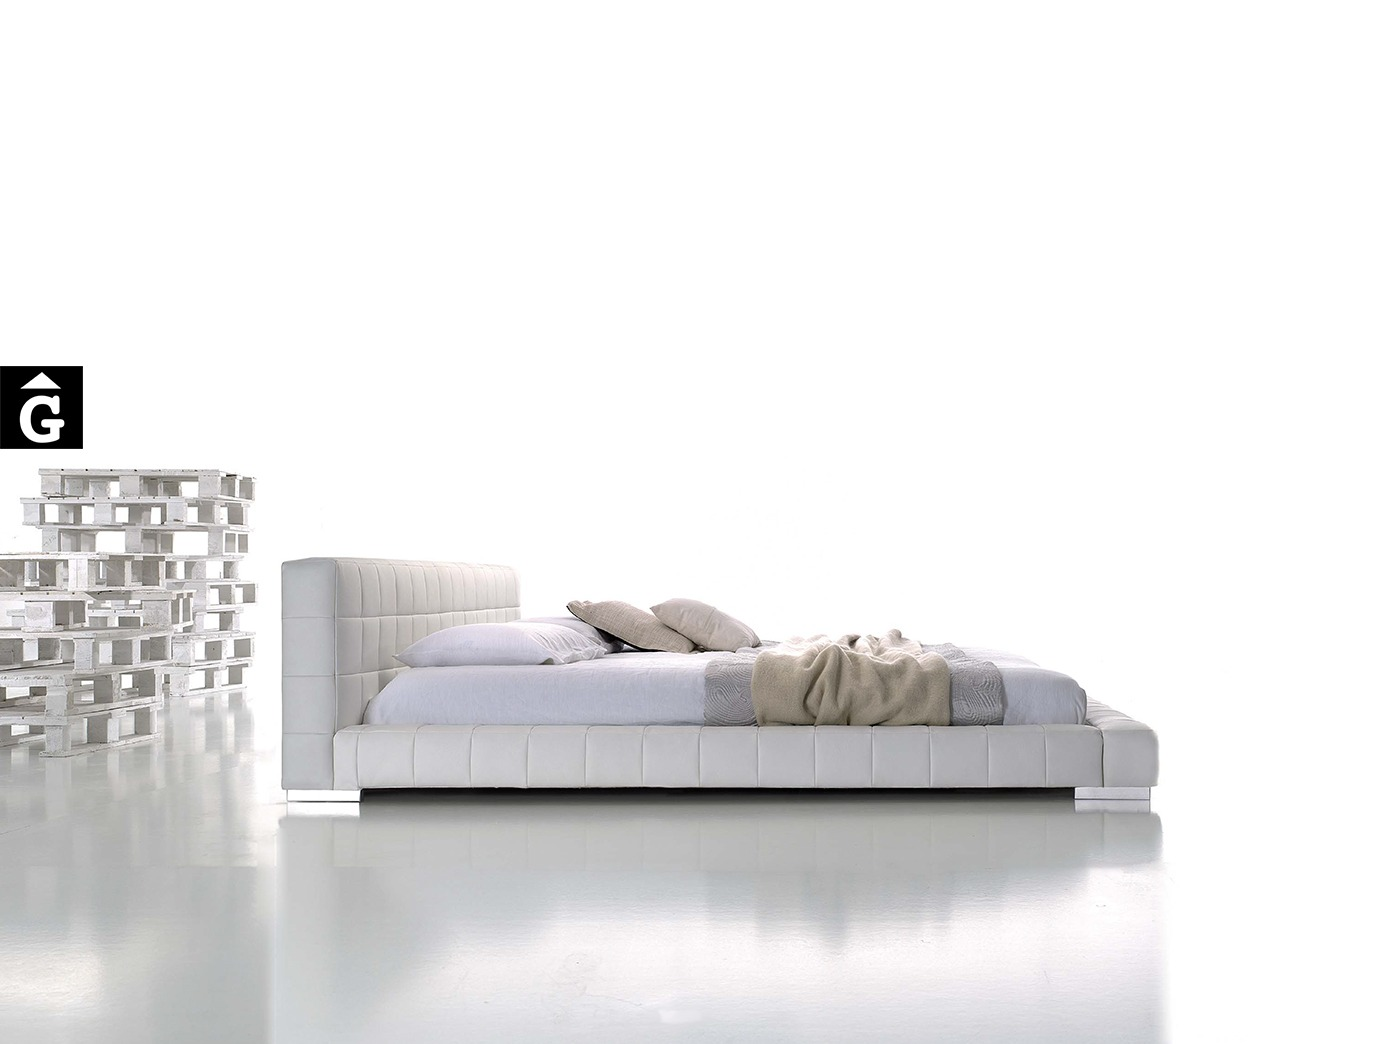 MORADILLO BY MOBLES GIFREU BEDS LLIT TAPISSAT RECTA PETIT CAPITONÉ GIRONA